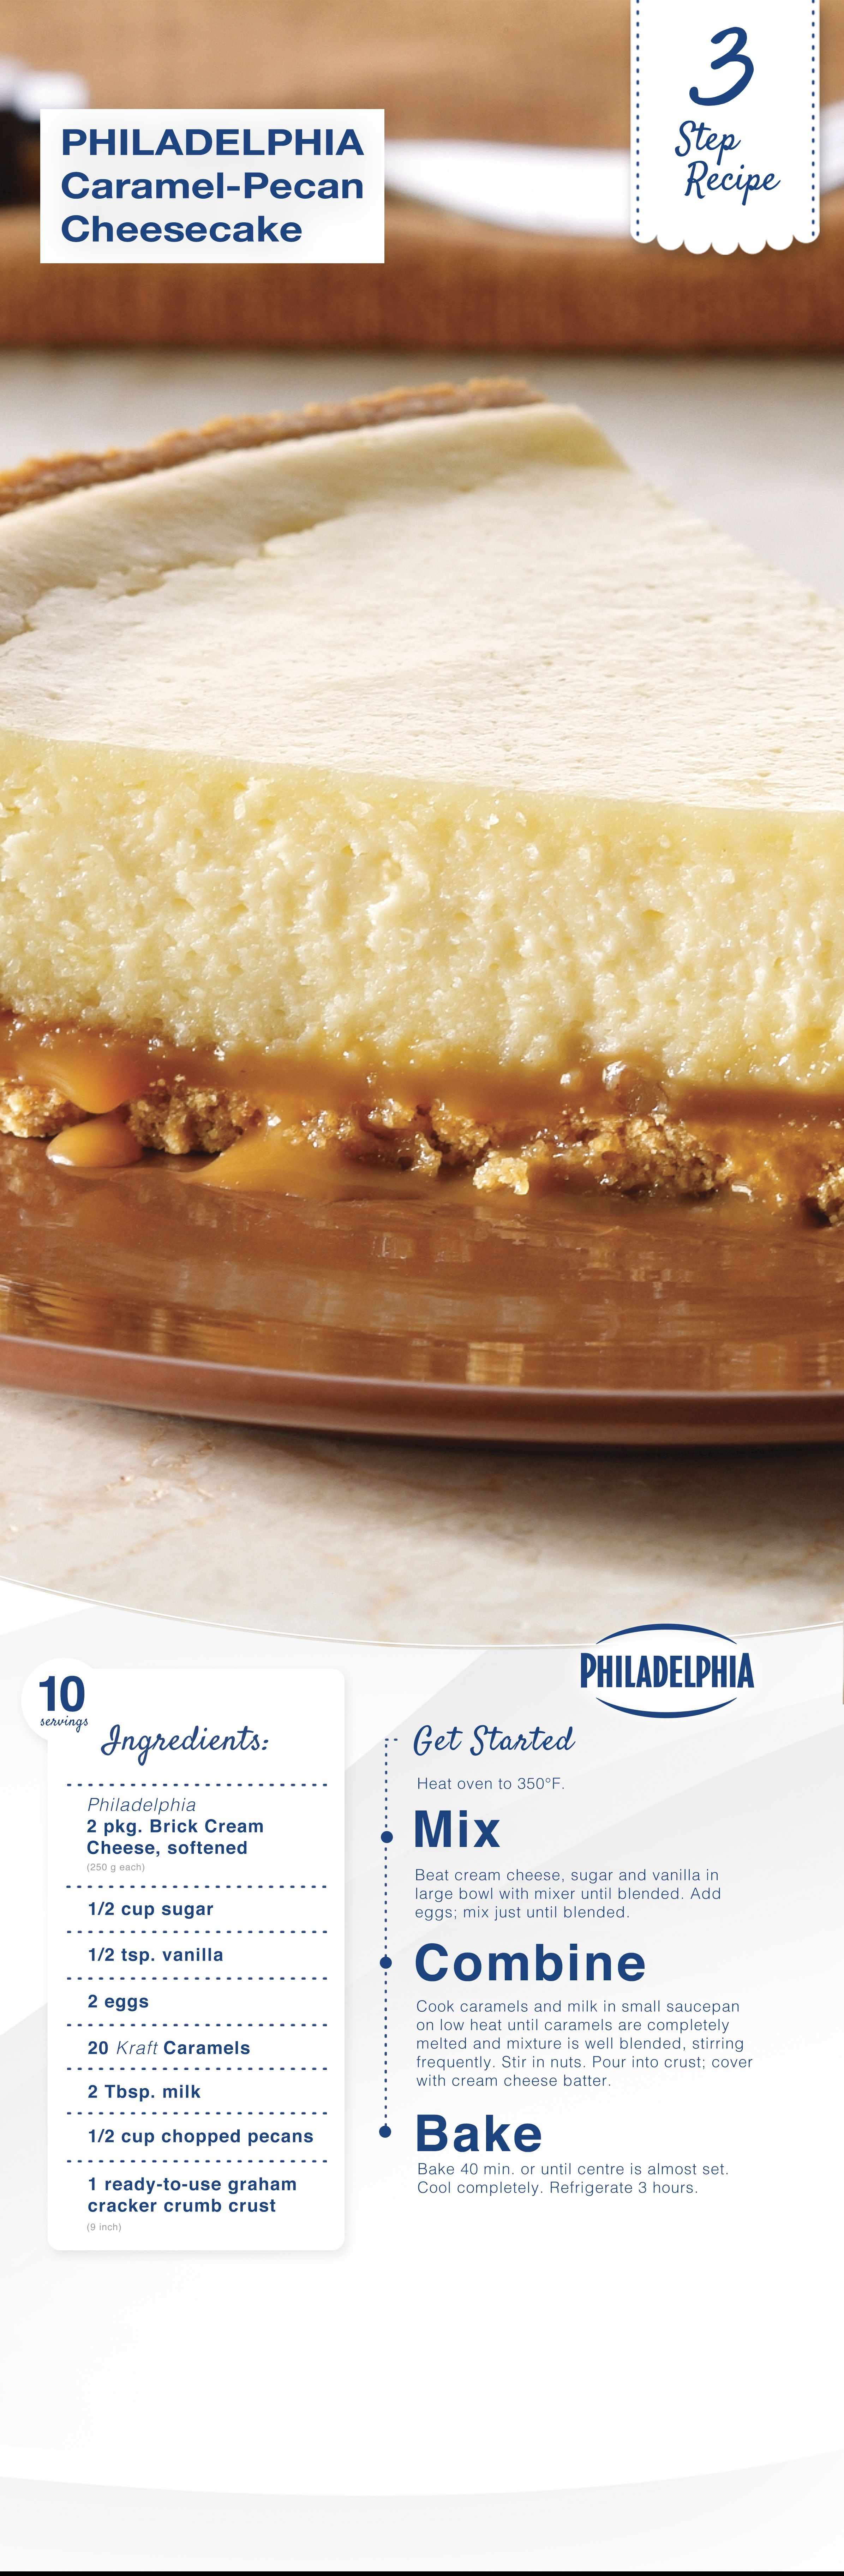 Philadelphia 3 Step Caramel Pecan Cheesecake With Philly Cream Cheese Caramel Pecan Cheesecake Cream Cheese Recipes Desserts